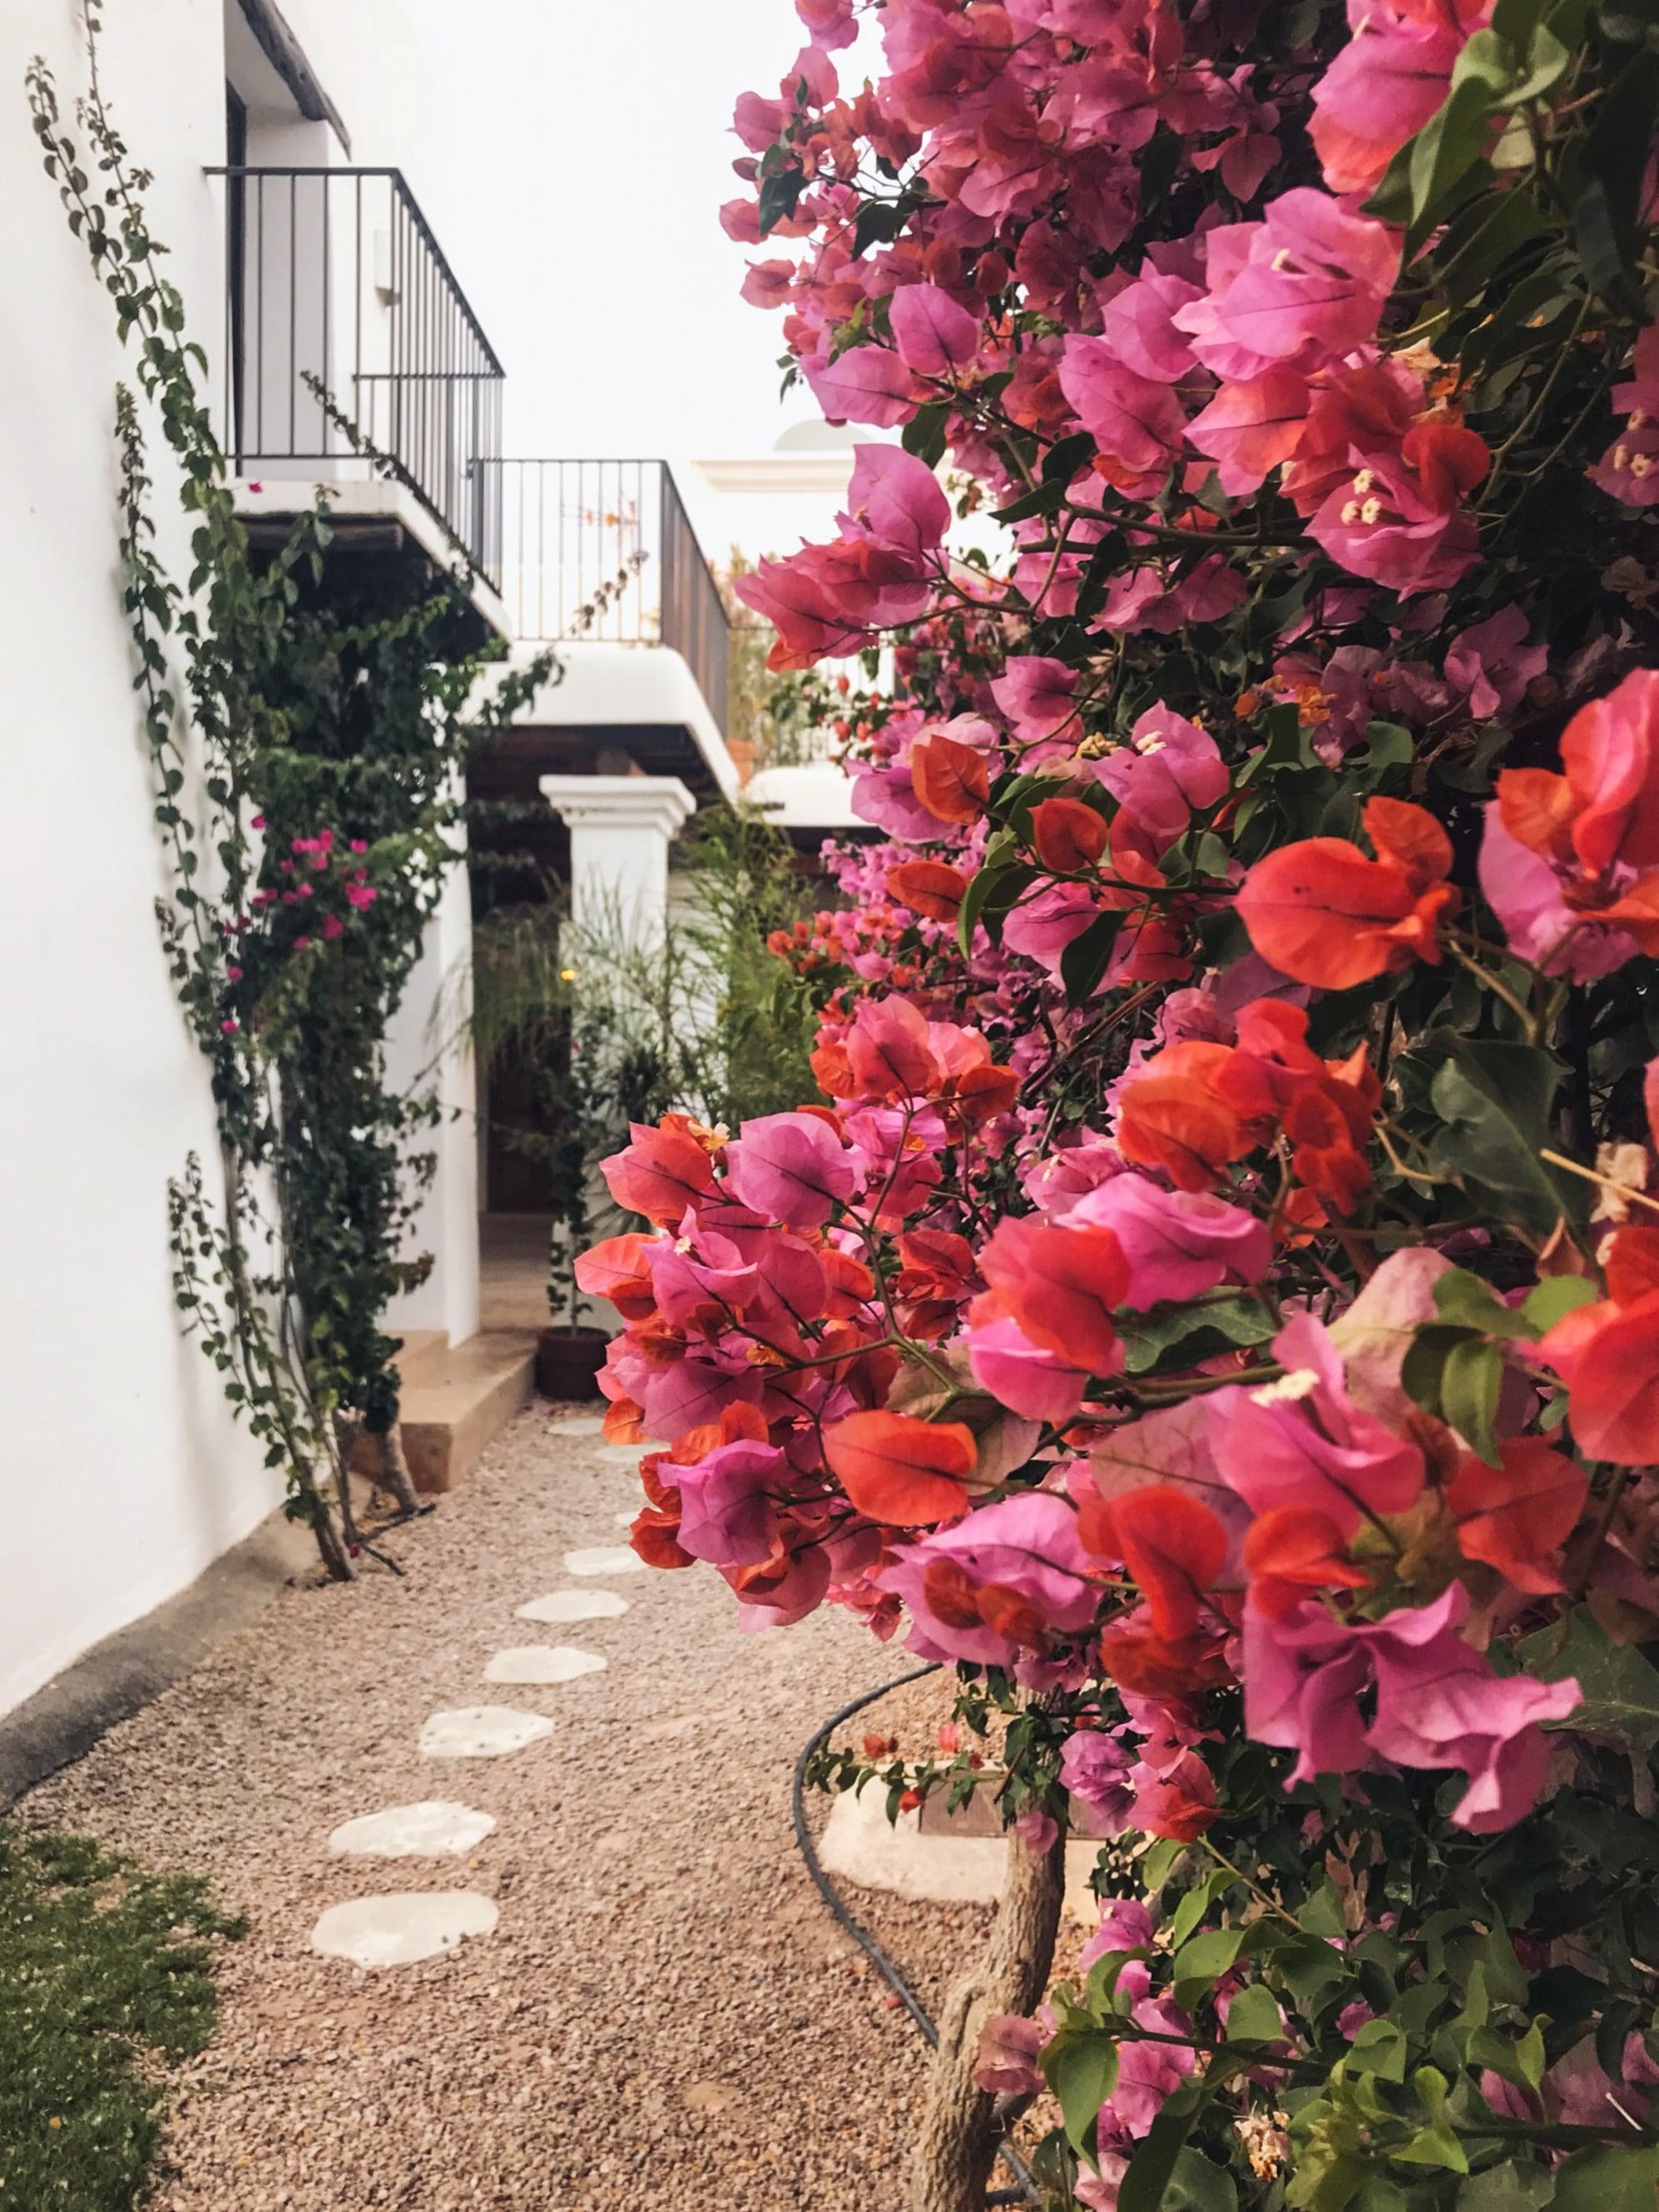 Ibiza-bloemen-Siempre-Agosto-Tanja-van-Hoogdalem